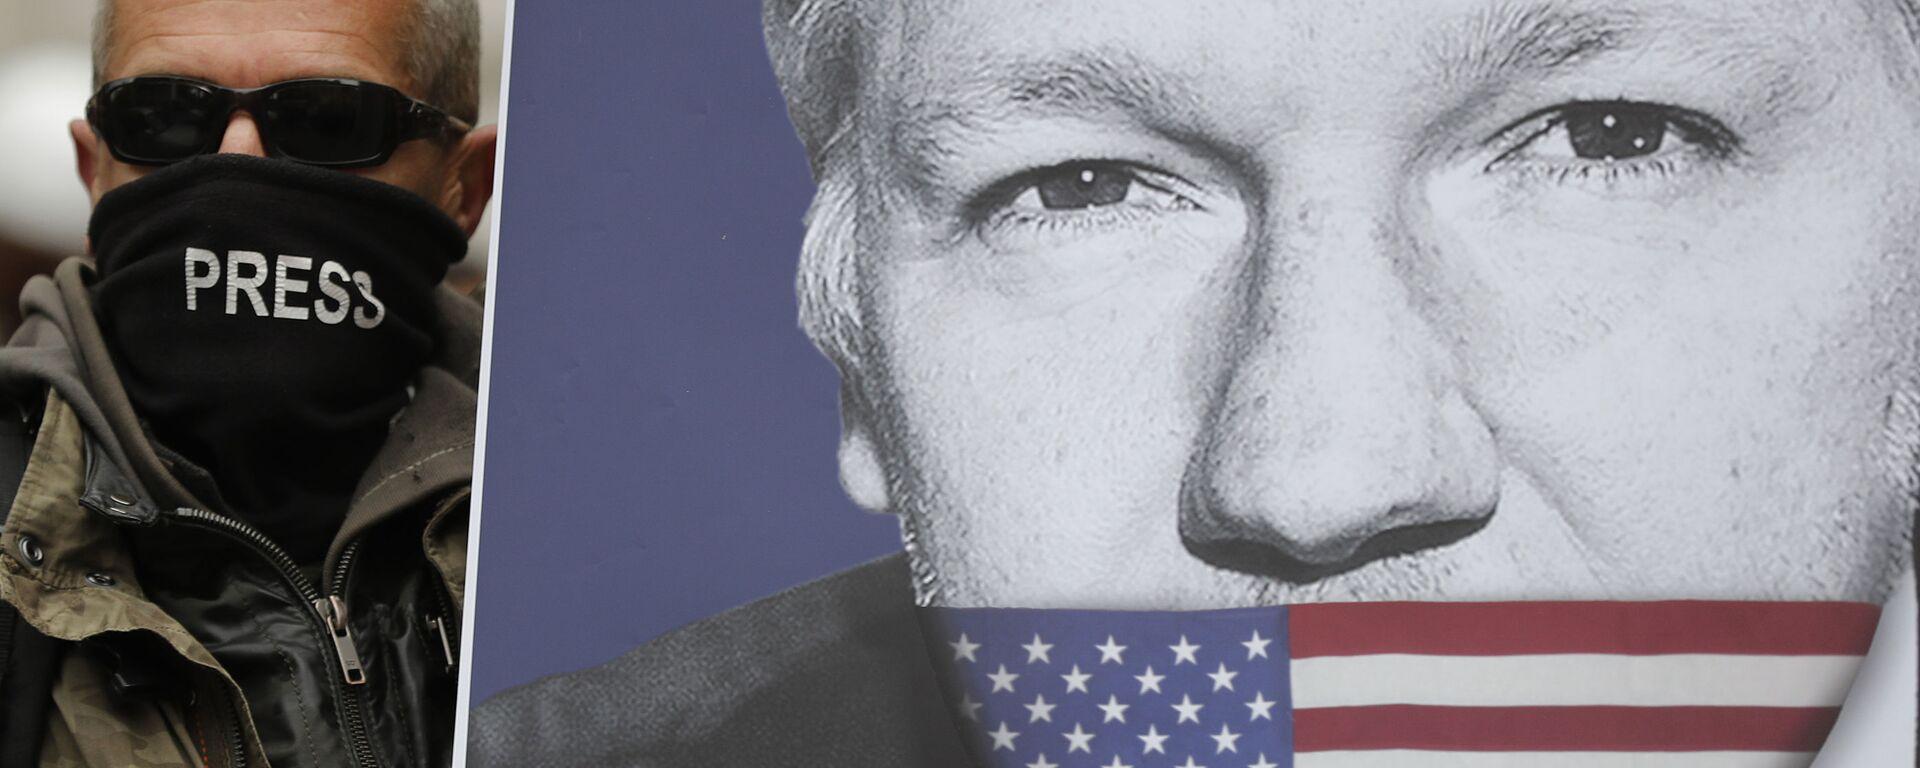 El retrato de Julian Assange - Sputnik Mundo, 1920, 09.07.2021